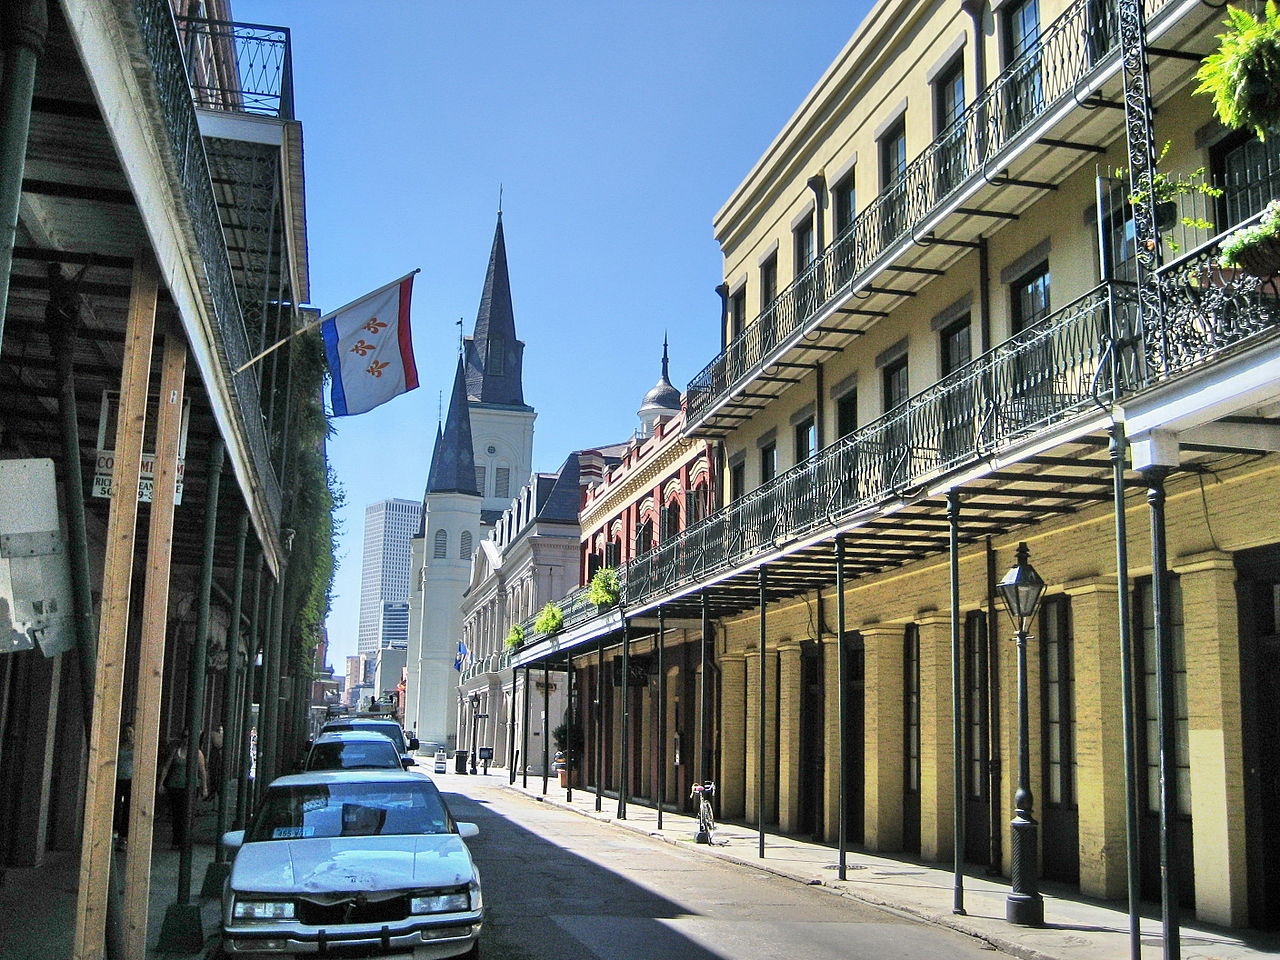 Bairro francês, New Orleans.